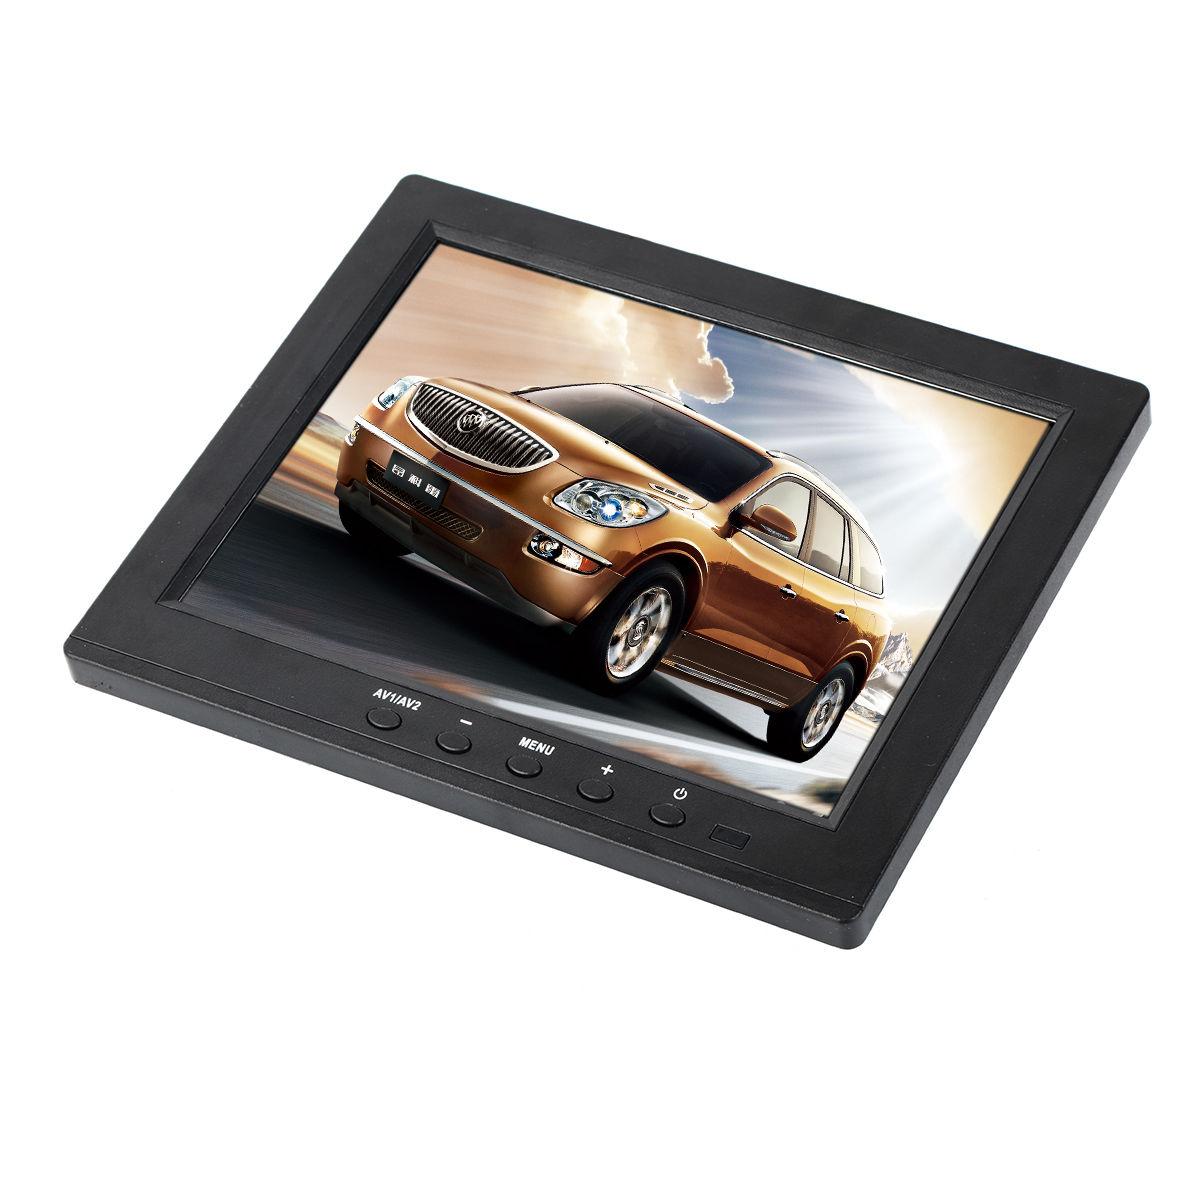 New-8-034-TFT-Car-Reverse-Surveillance-CCTV-Display-BNC-AV-VGA-HDMI-input-Monitor